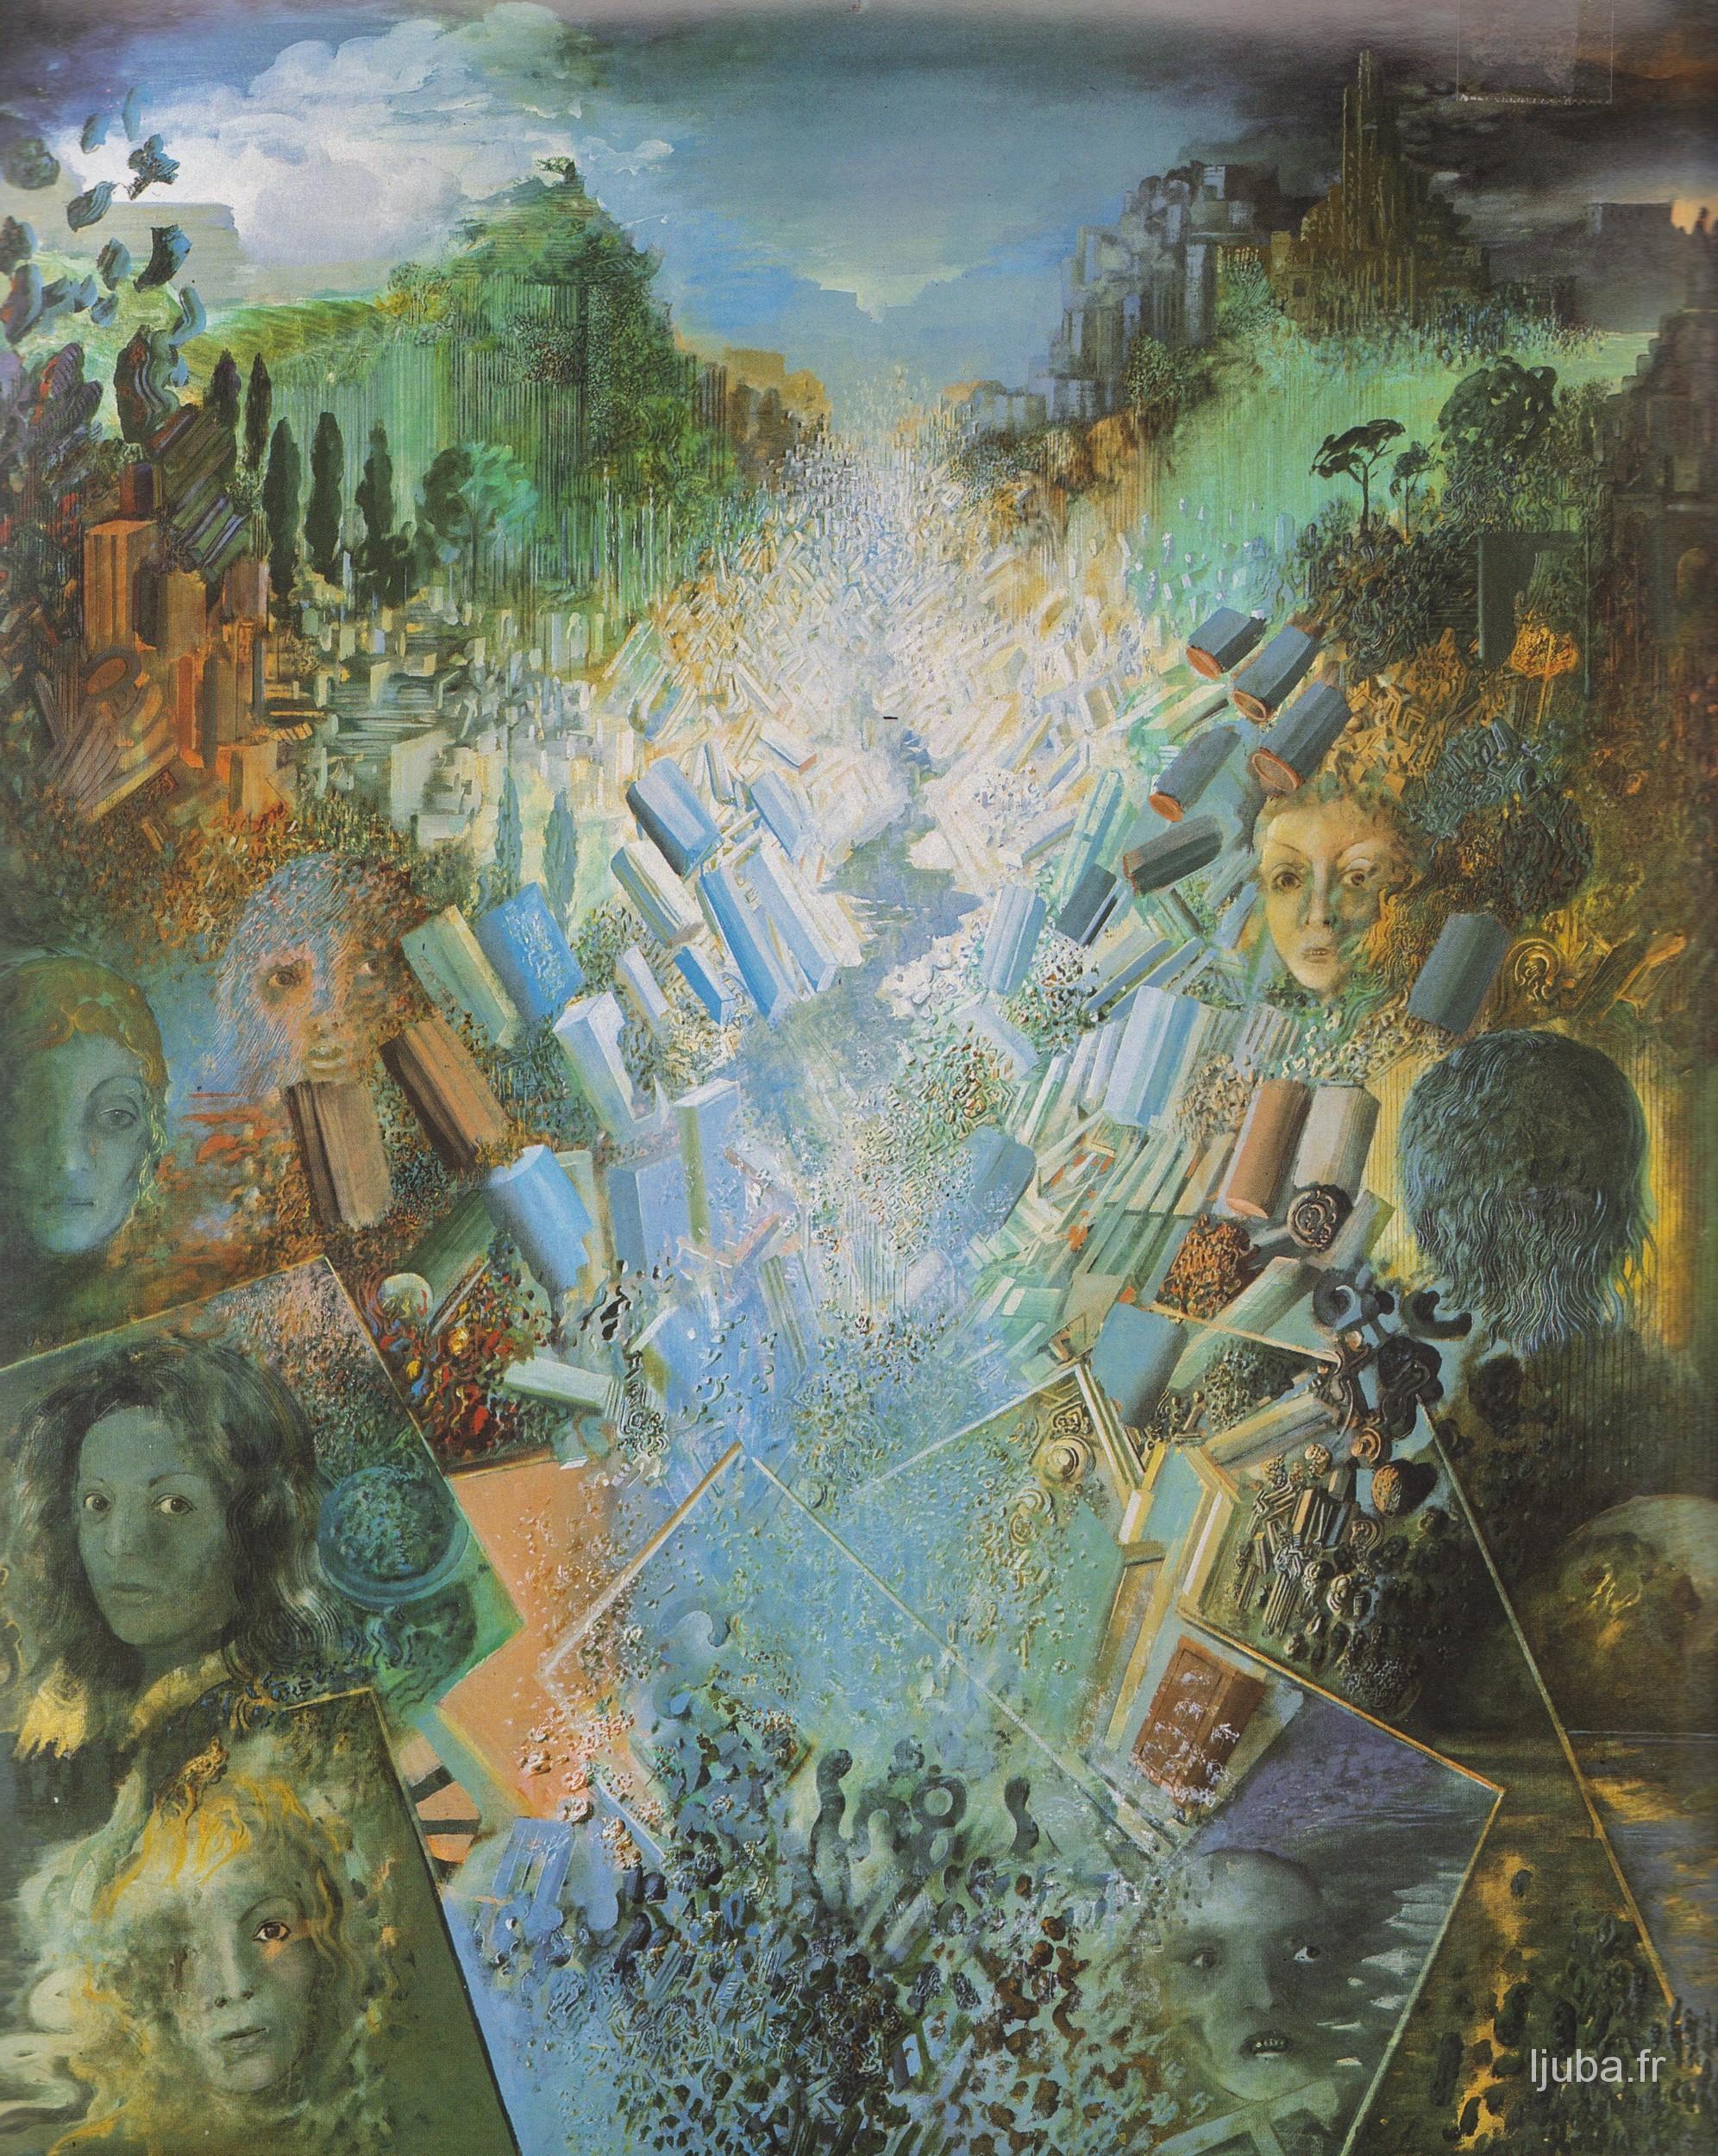 Ljuba Popovic - Le secret de la mémoire, 1983-82